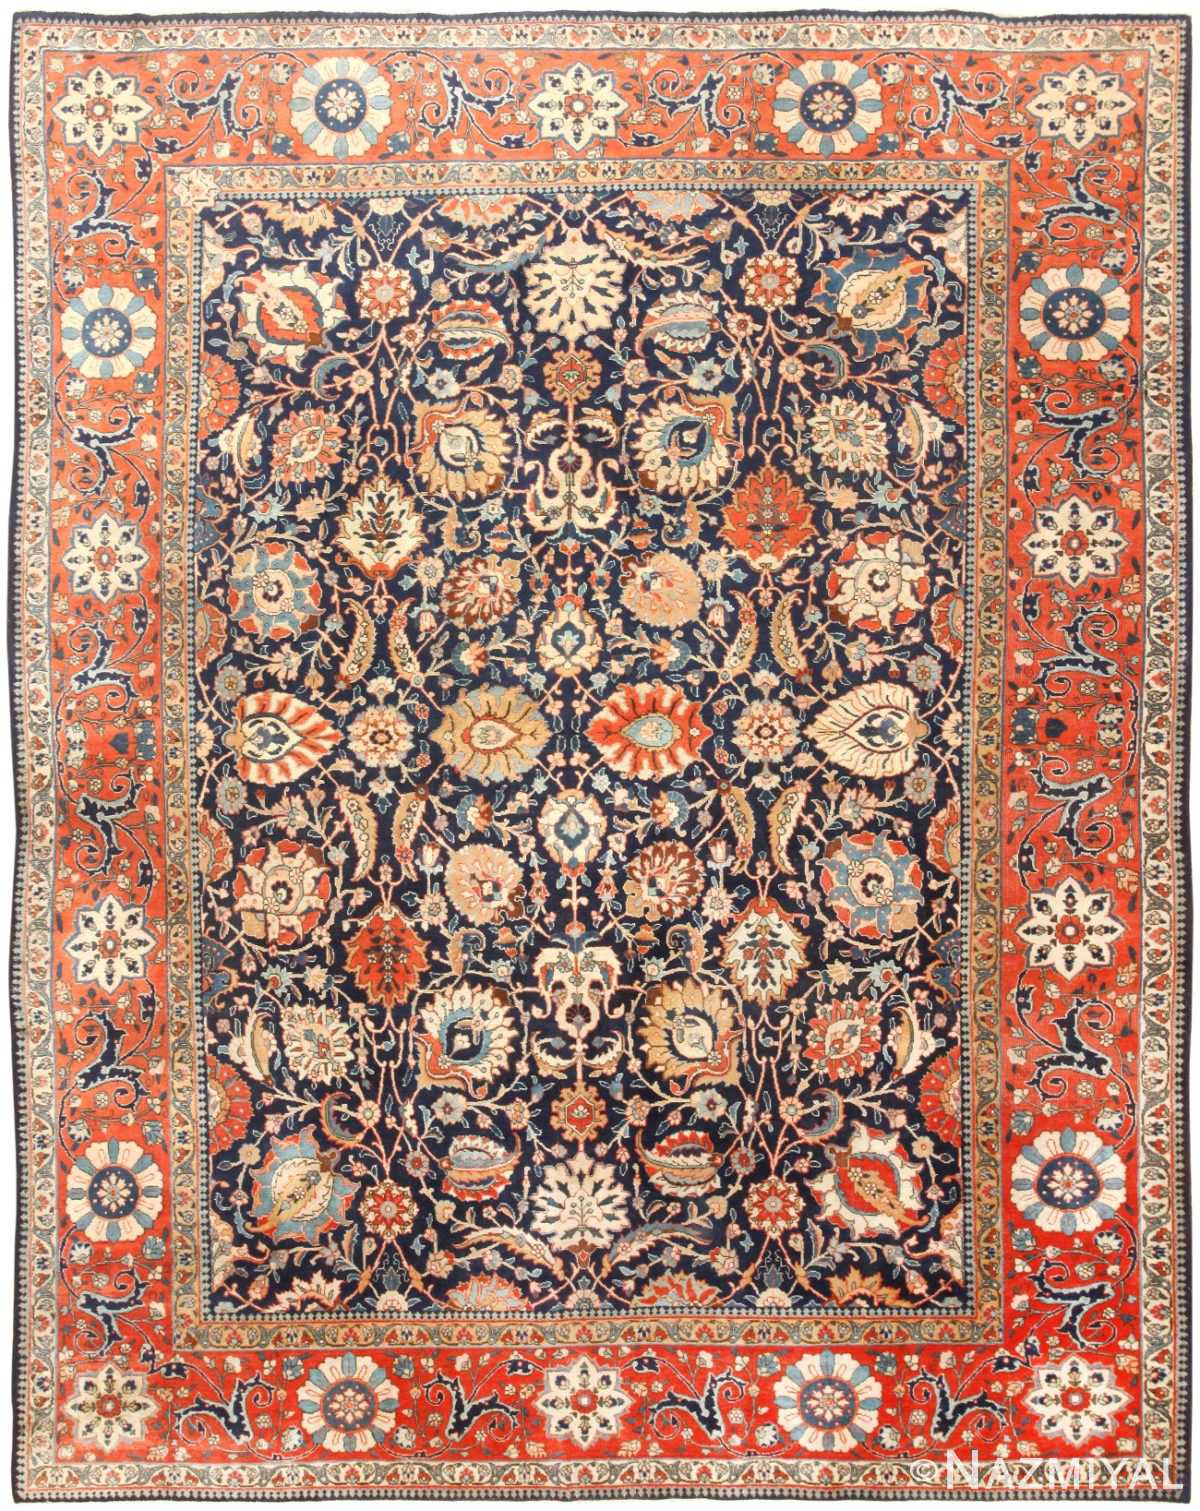 Antique Persian Tabriz Rug 47064 Detail/Large View